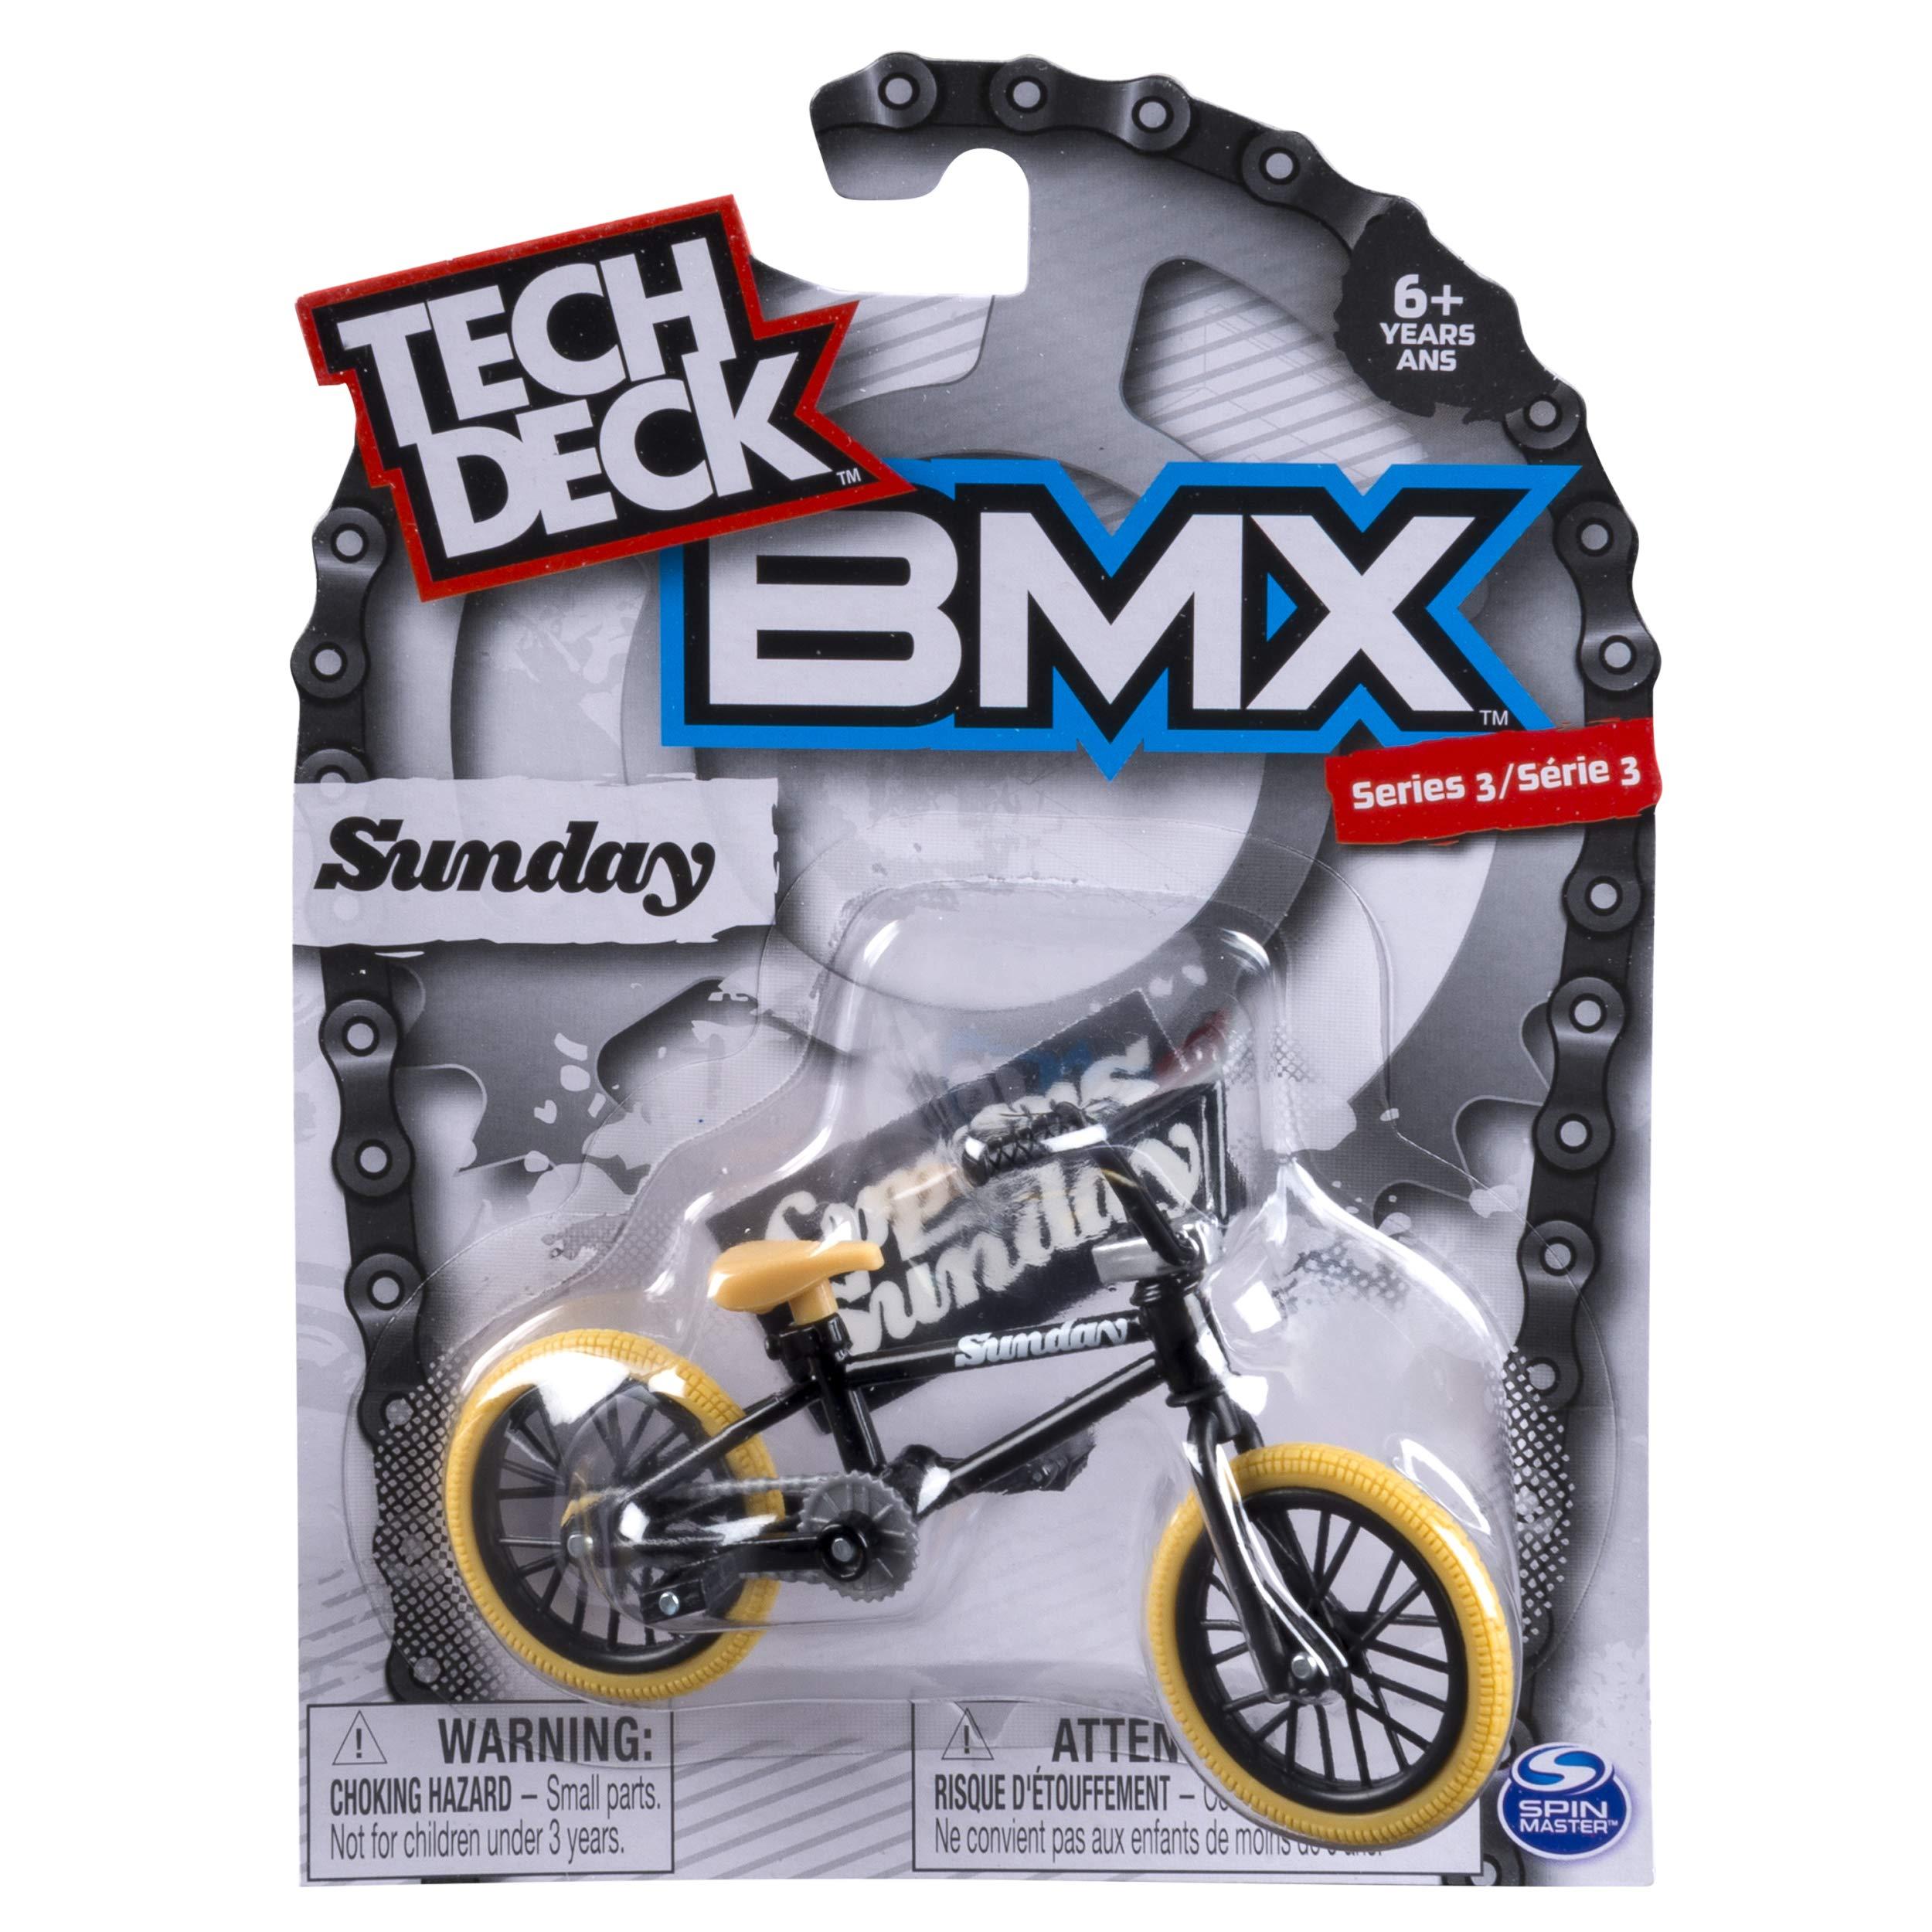 Tech Deck - BMX Finger Bike - Sunday - Black/Orange